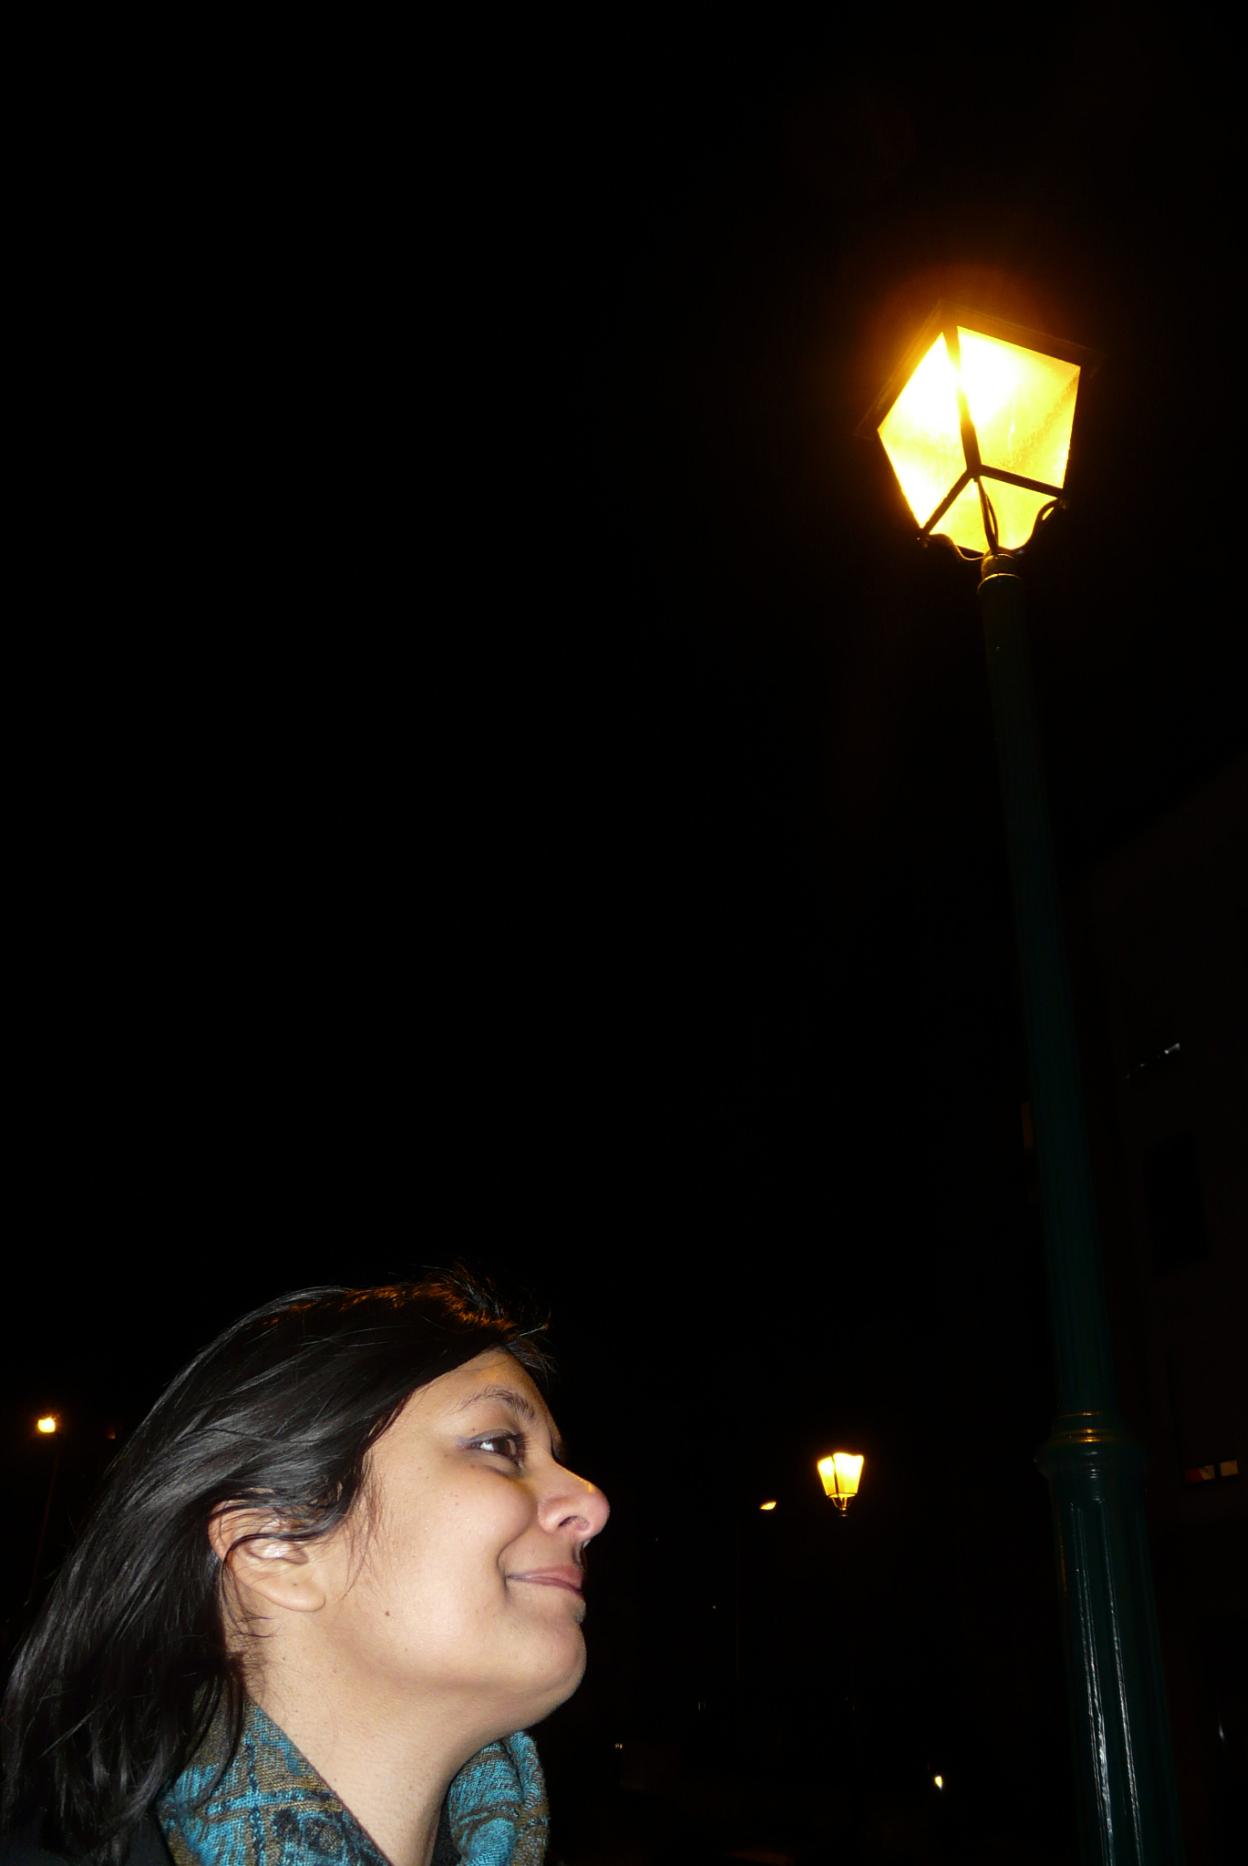 Atelier-du-lampadaire-Amena-Akbaraly.jpg